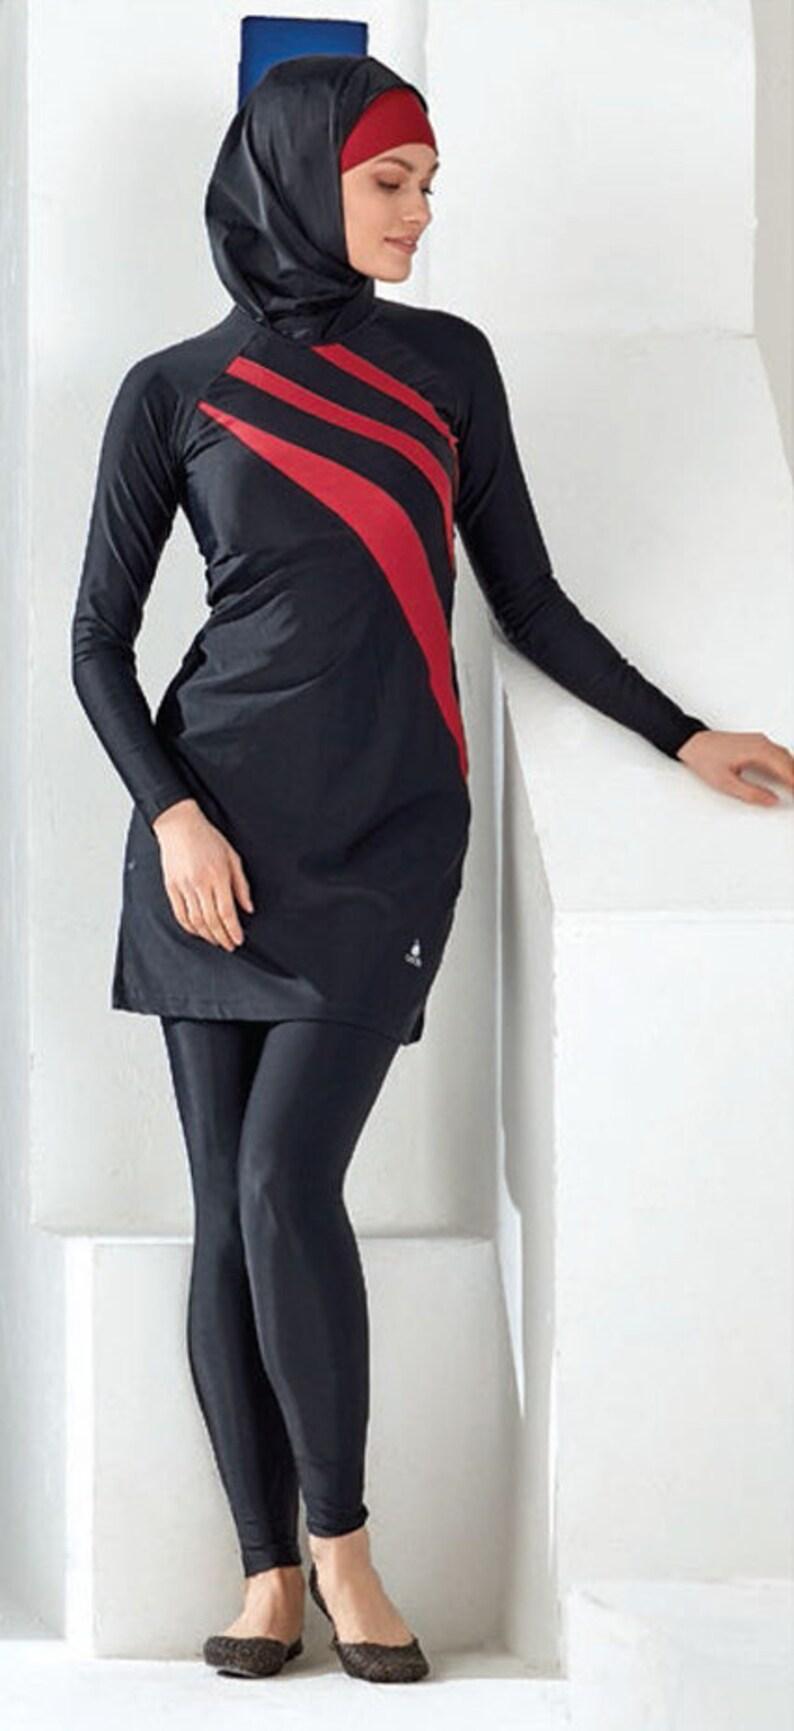 c98a7c3a7b3ea Adabkini Gozde Muslim Swimsuit Islamic Full Cover Modest | Etsy